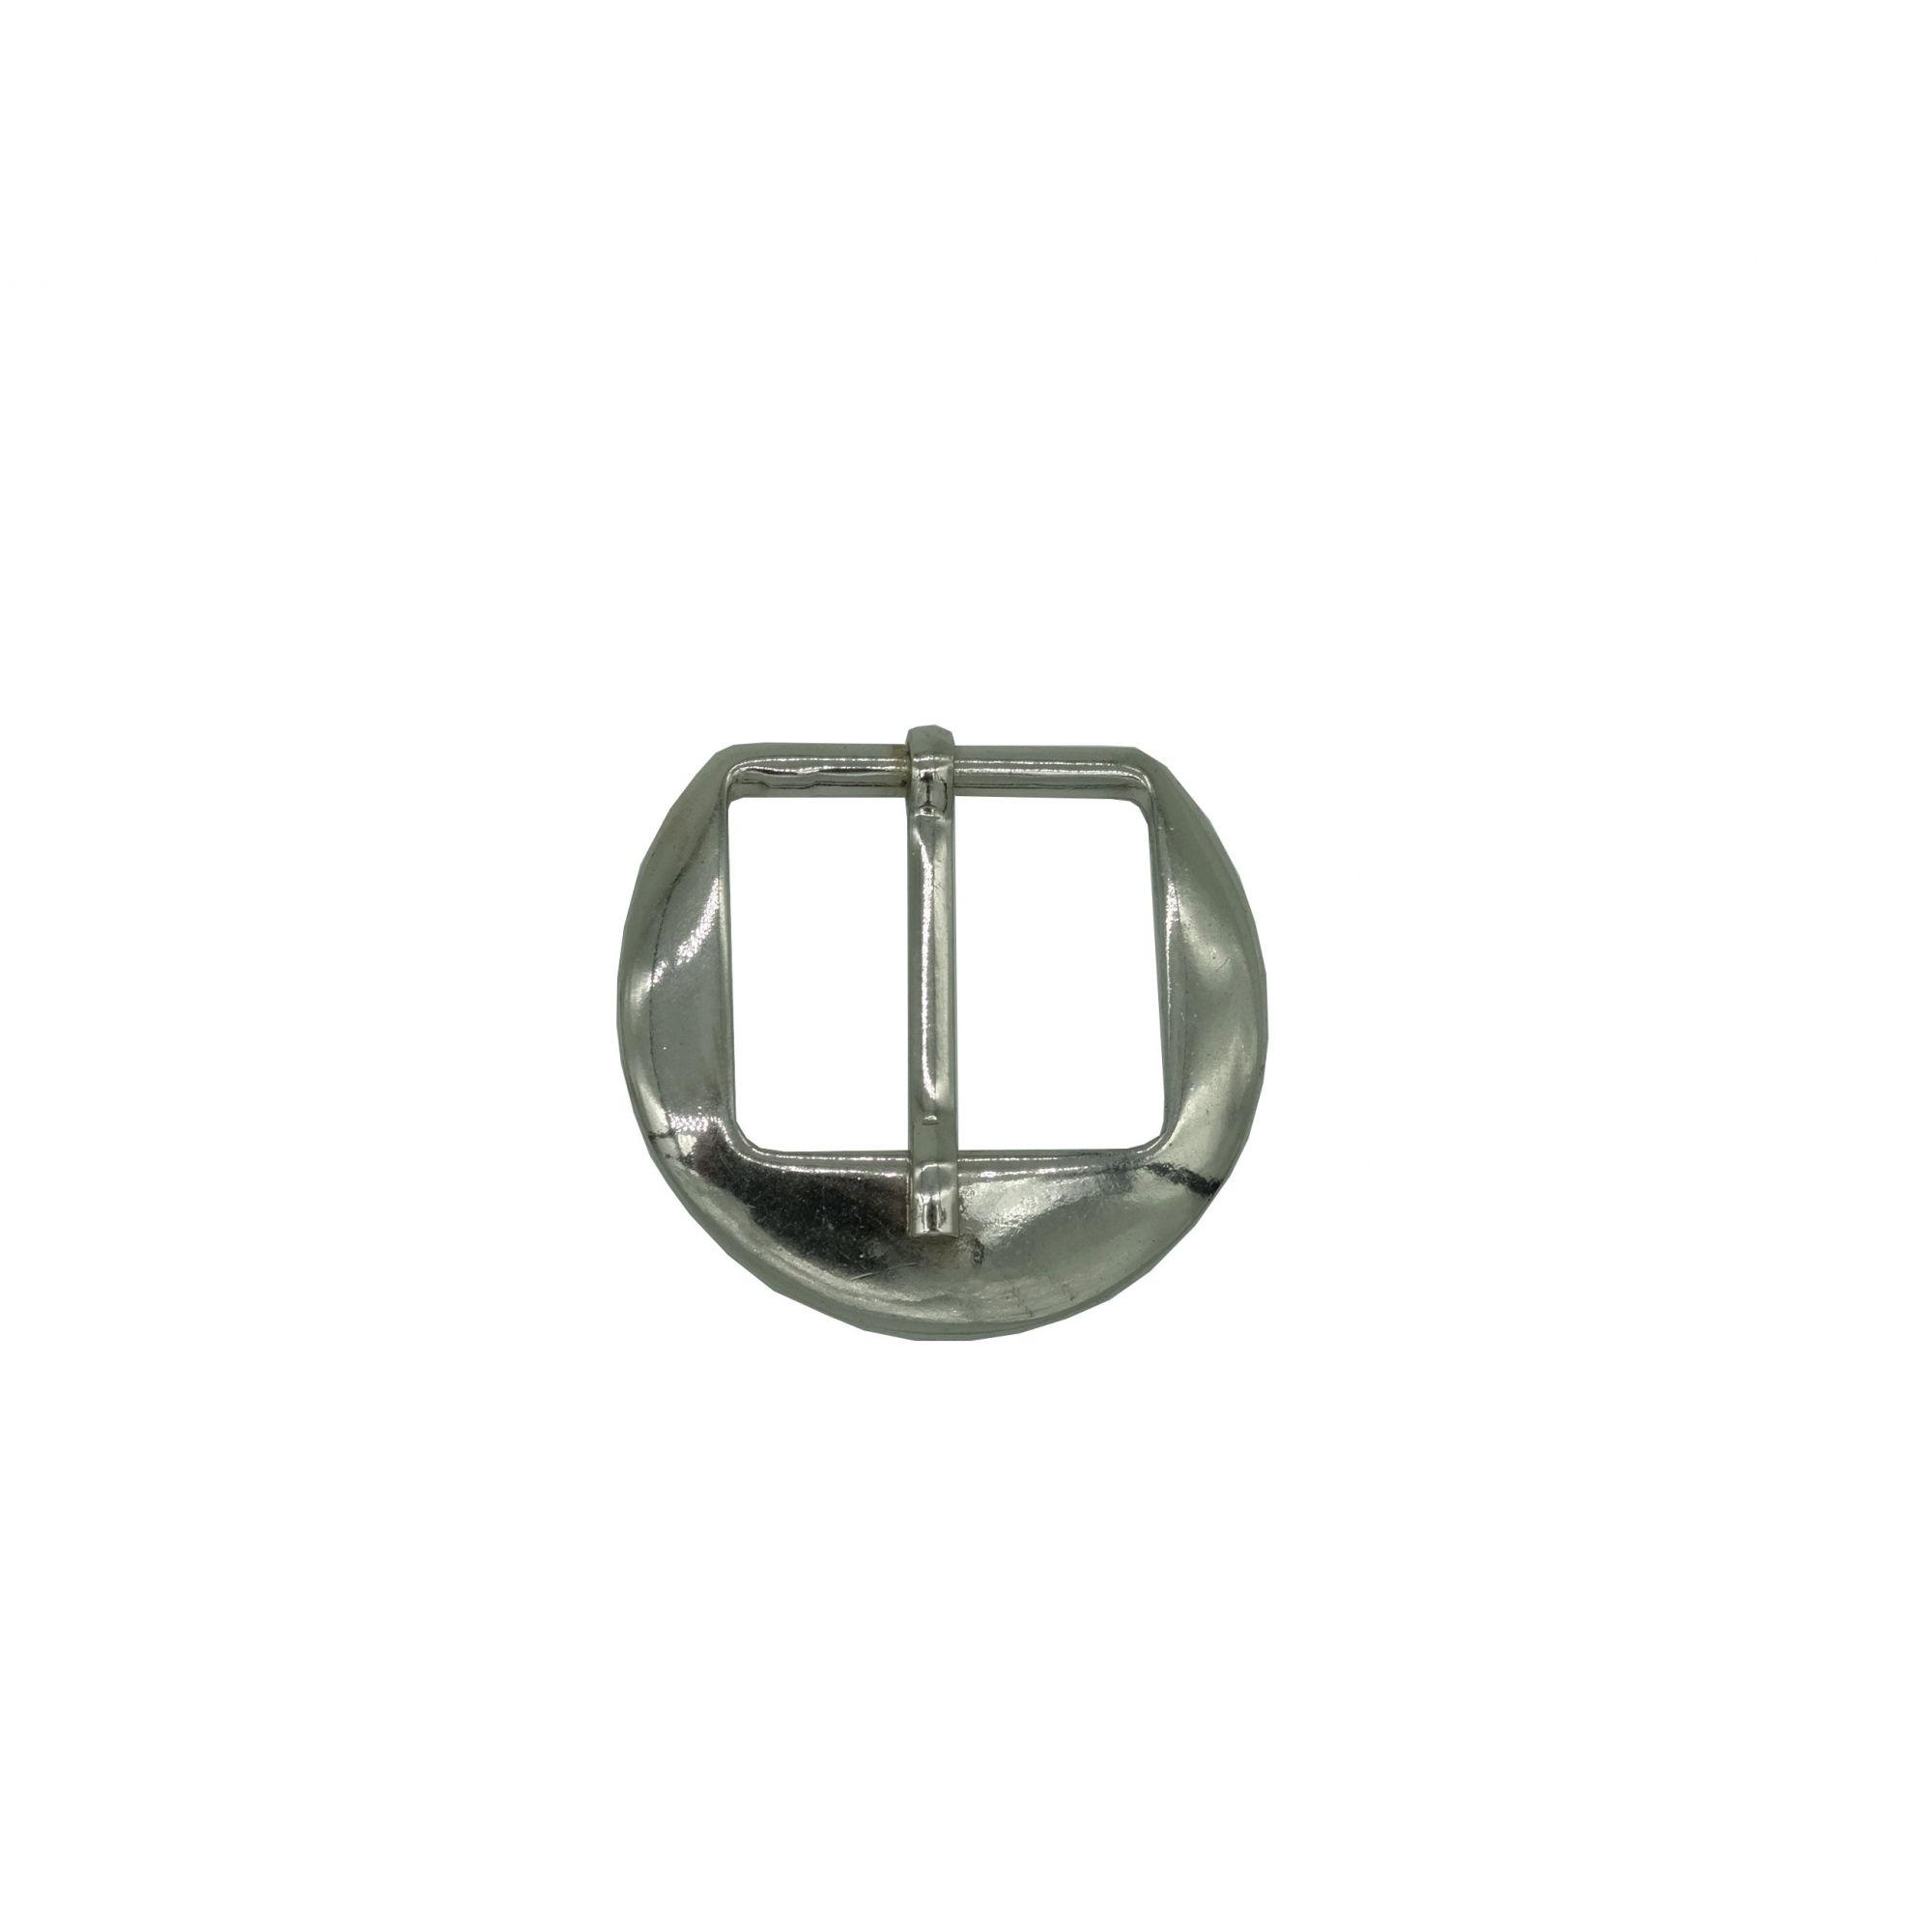 RG0287-35 FIVELA OURO CLARO | PCT COM 30 PCS